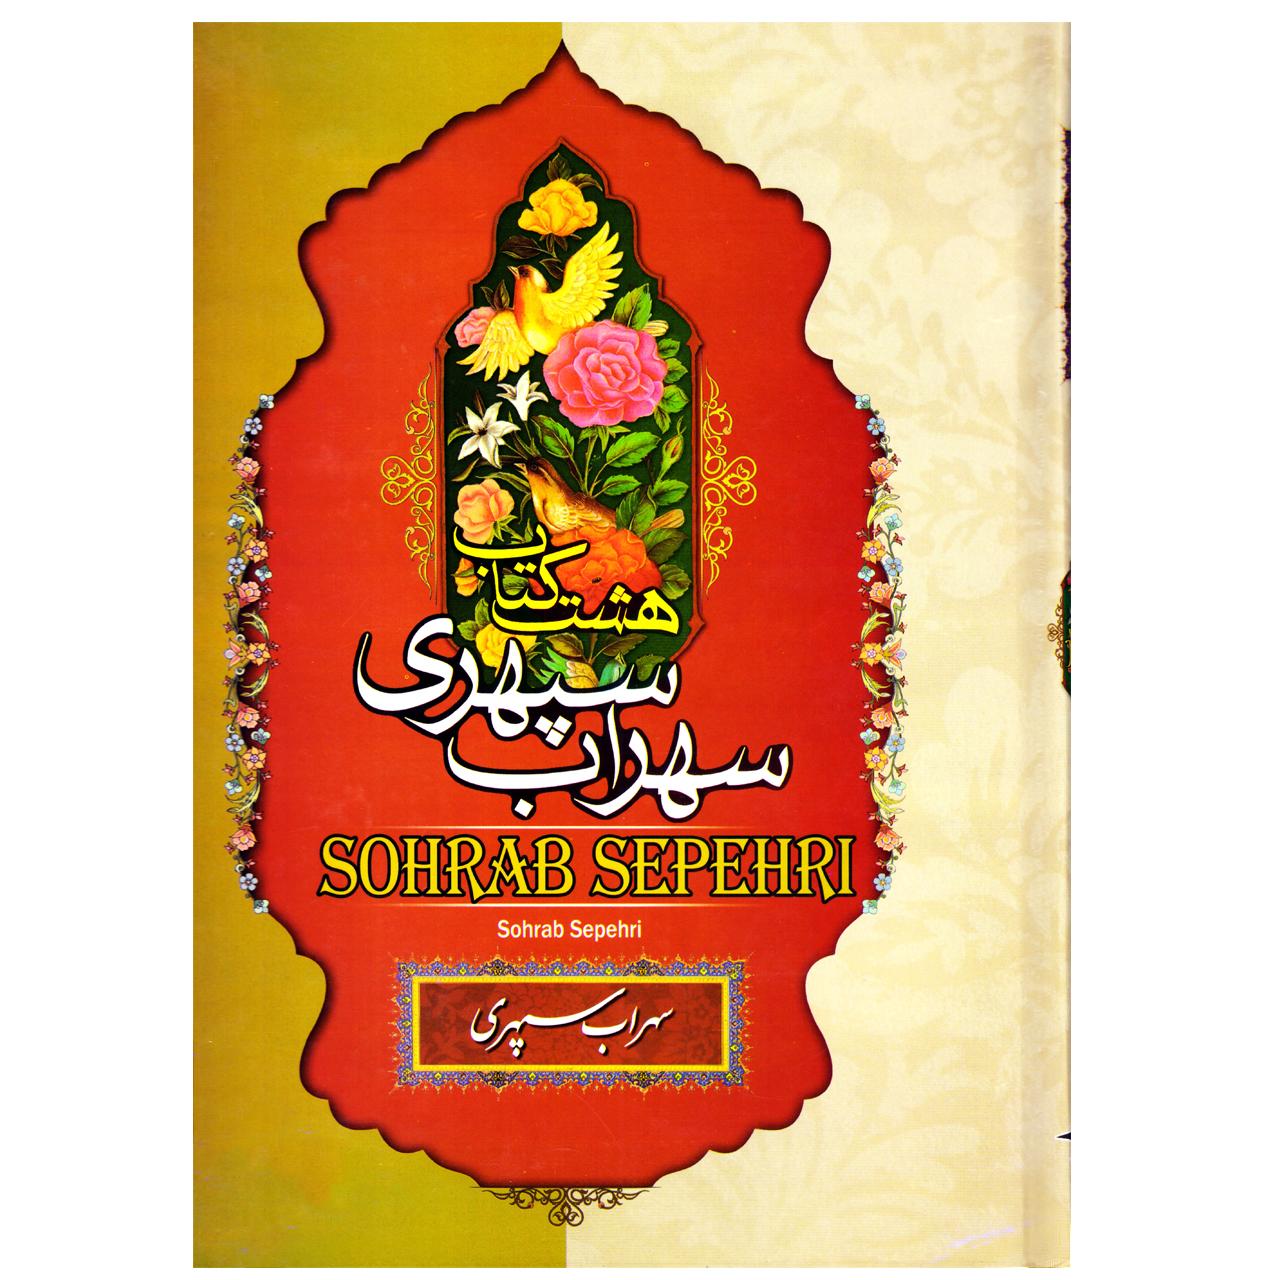 خرید                      کتاب شعر نفیس هشت کتاب اثر سهراب سپهری جلد گالینگور نشر نگار آشنا